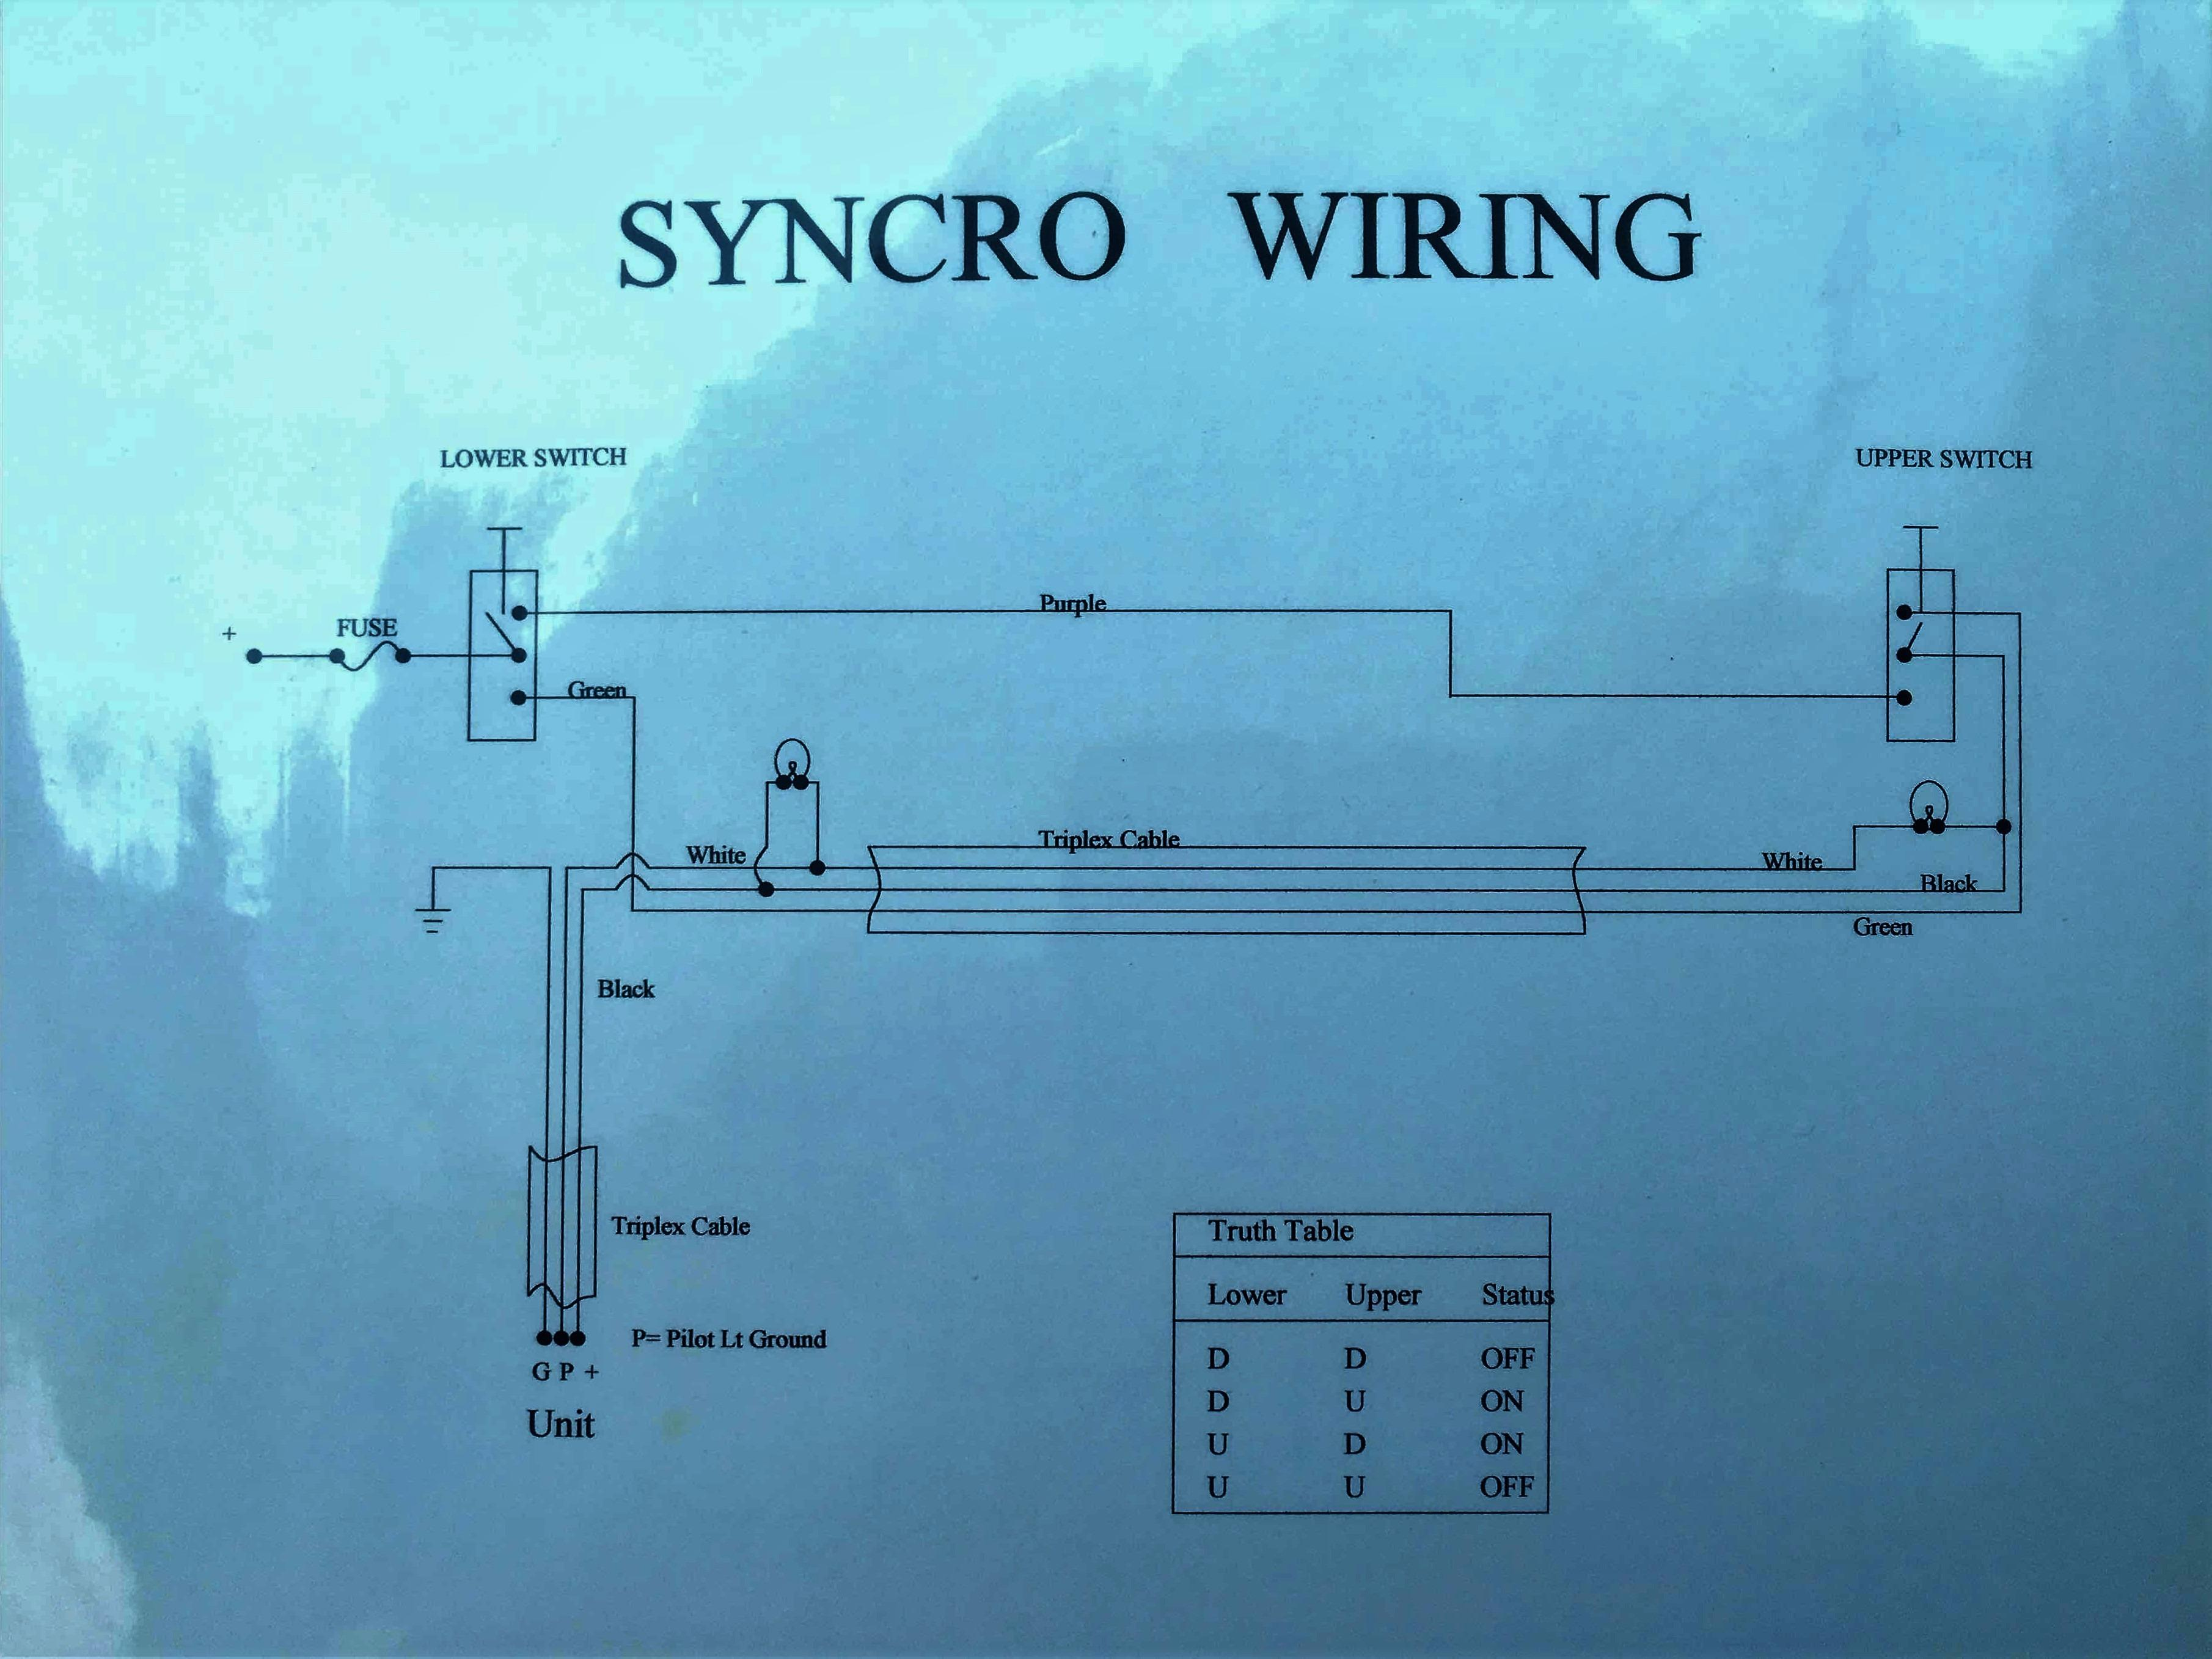 Apelco Vhf 4500 Radio Wiring Diagram 36 Images 1988 Pontiac Delco 5848139 20160724124726348 1 Xlargew3620h2715t1481934922000 Defever 48 Trawler For Sale Gm